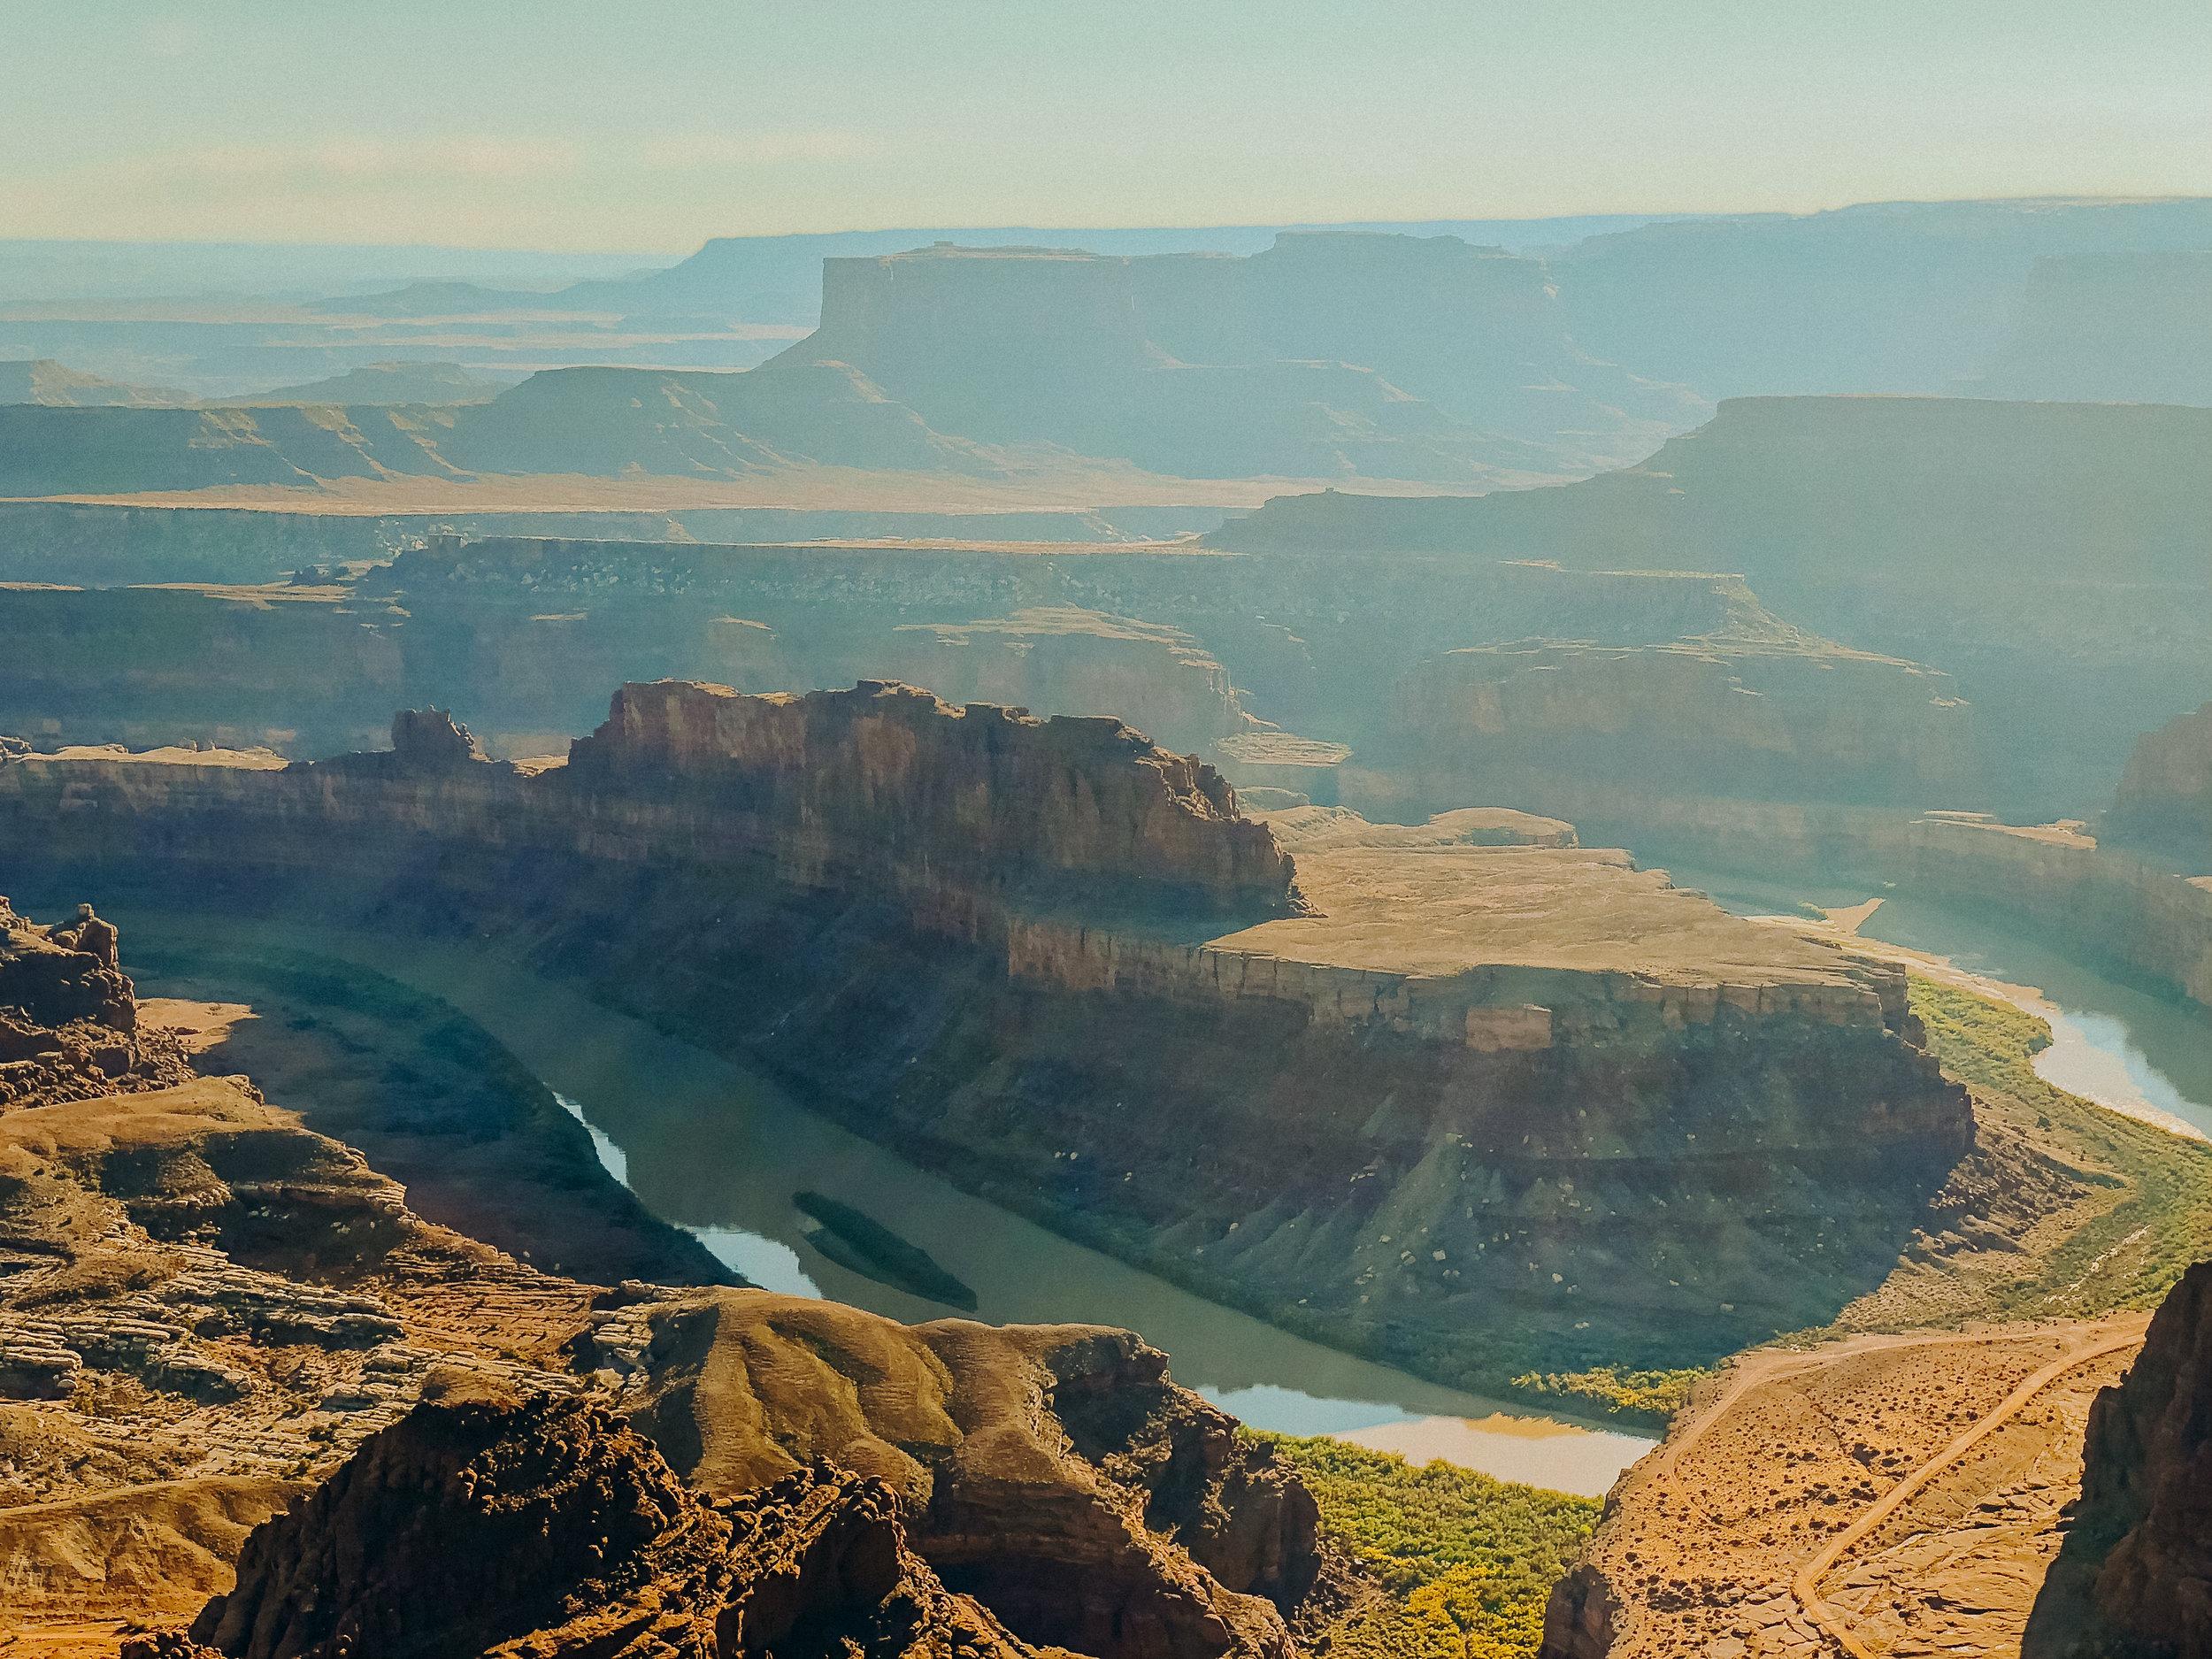 canyonlands national park travel blog-17.jpg